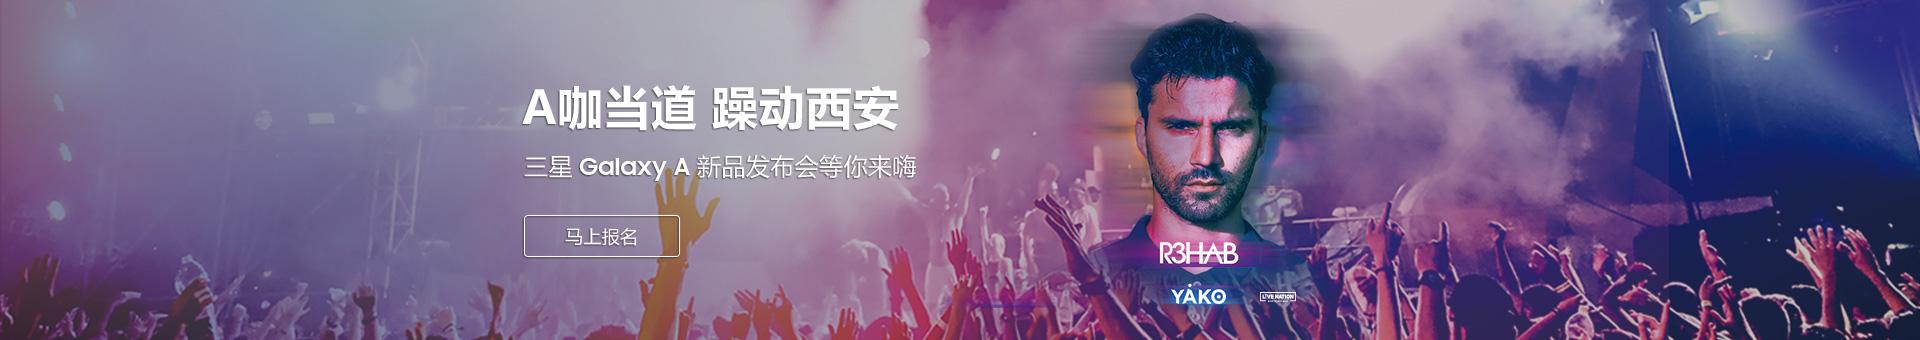 Galaxy A 新品发布会暨世界电音大咖庆祝公演报名